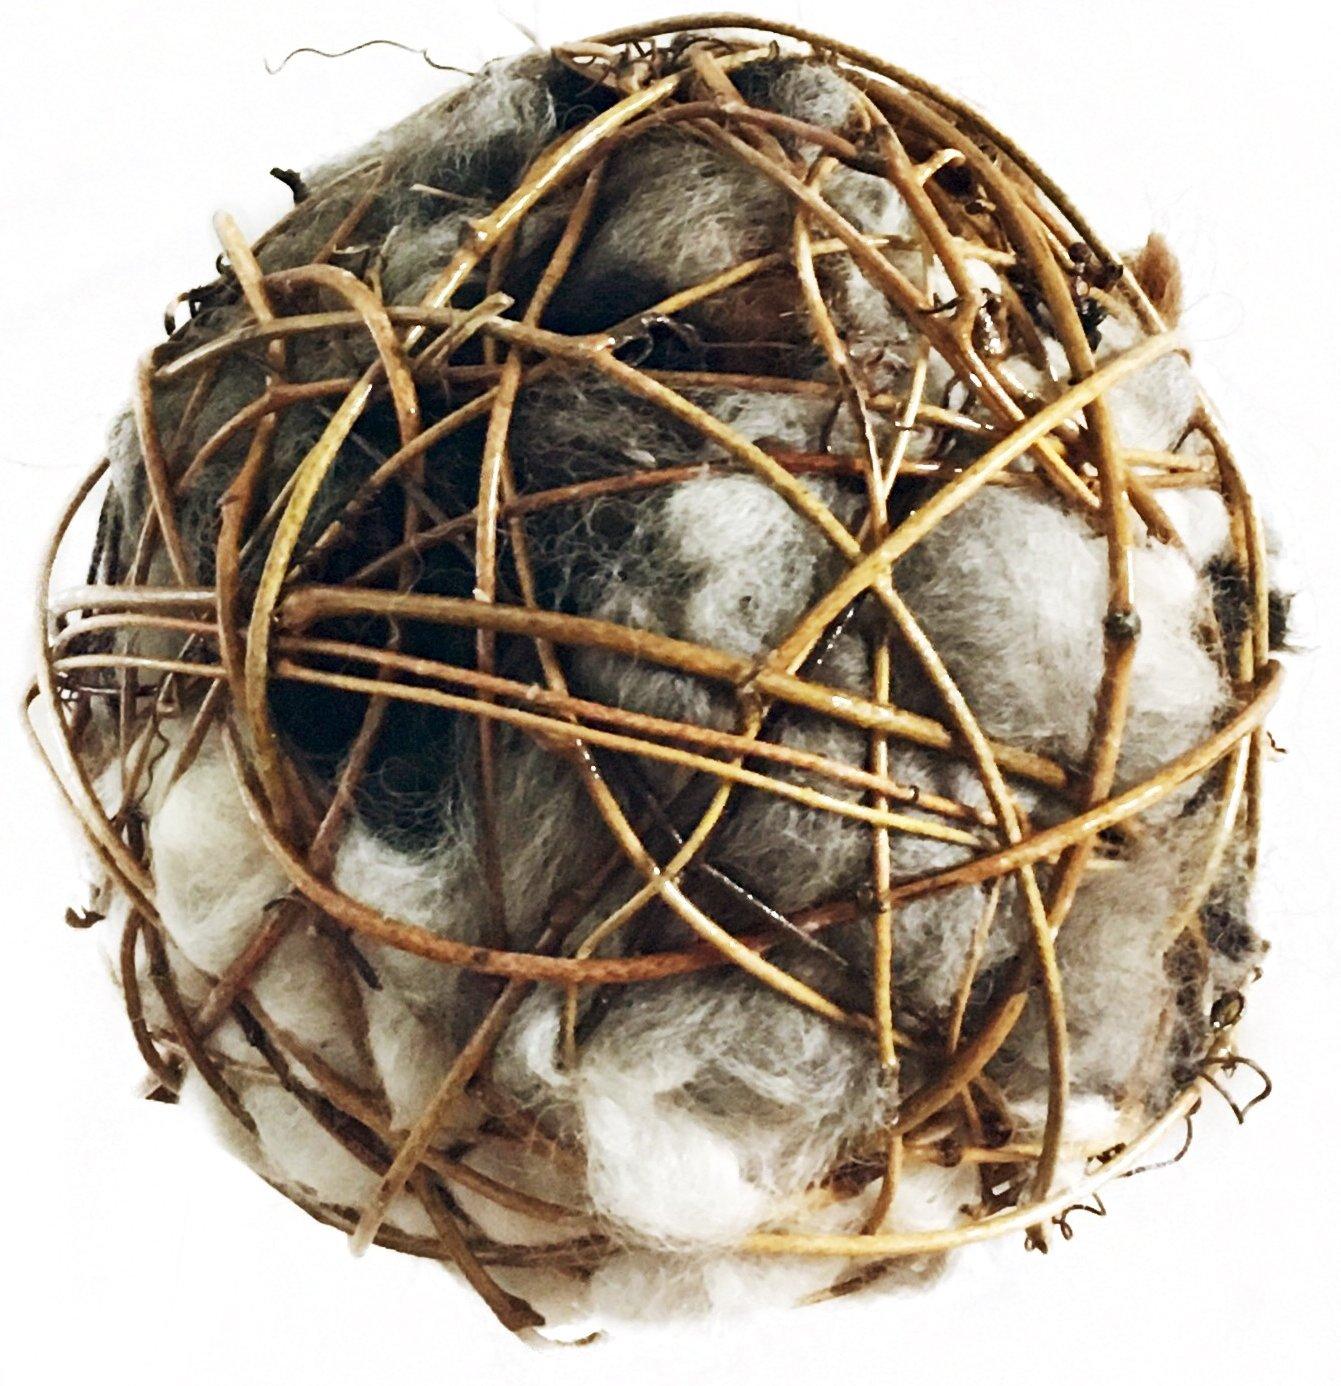 Bird Nesting Globe filled with Alpaca Fleece - All Natural, Hand Made in Montana (4'')